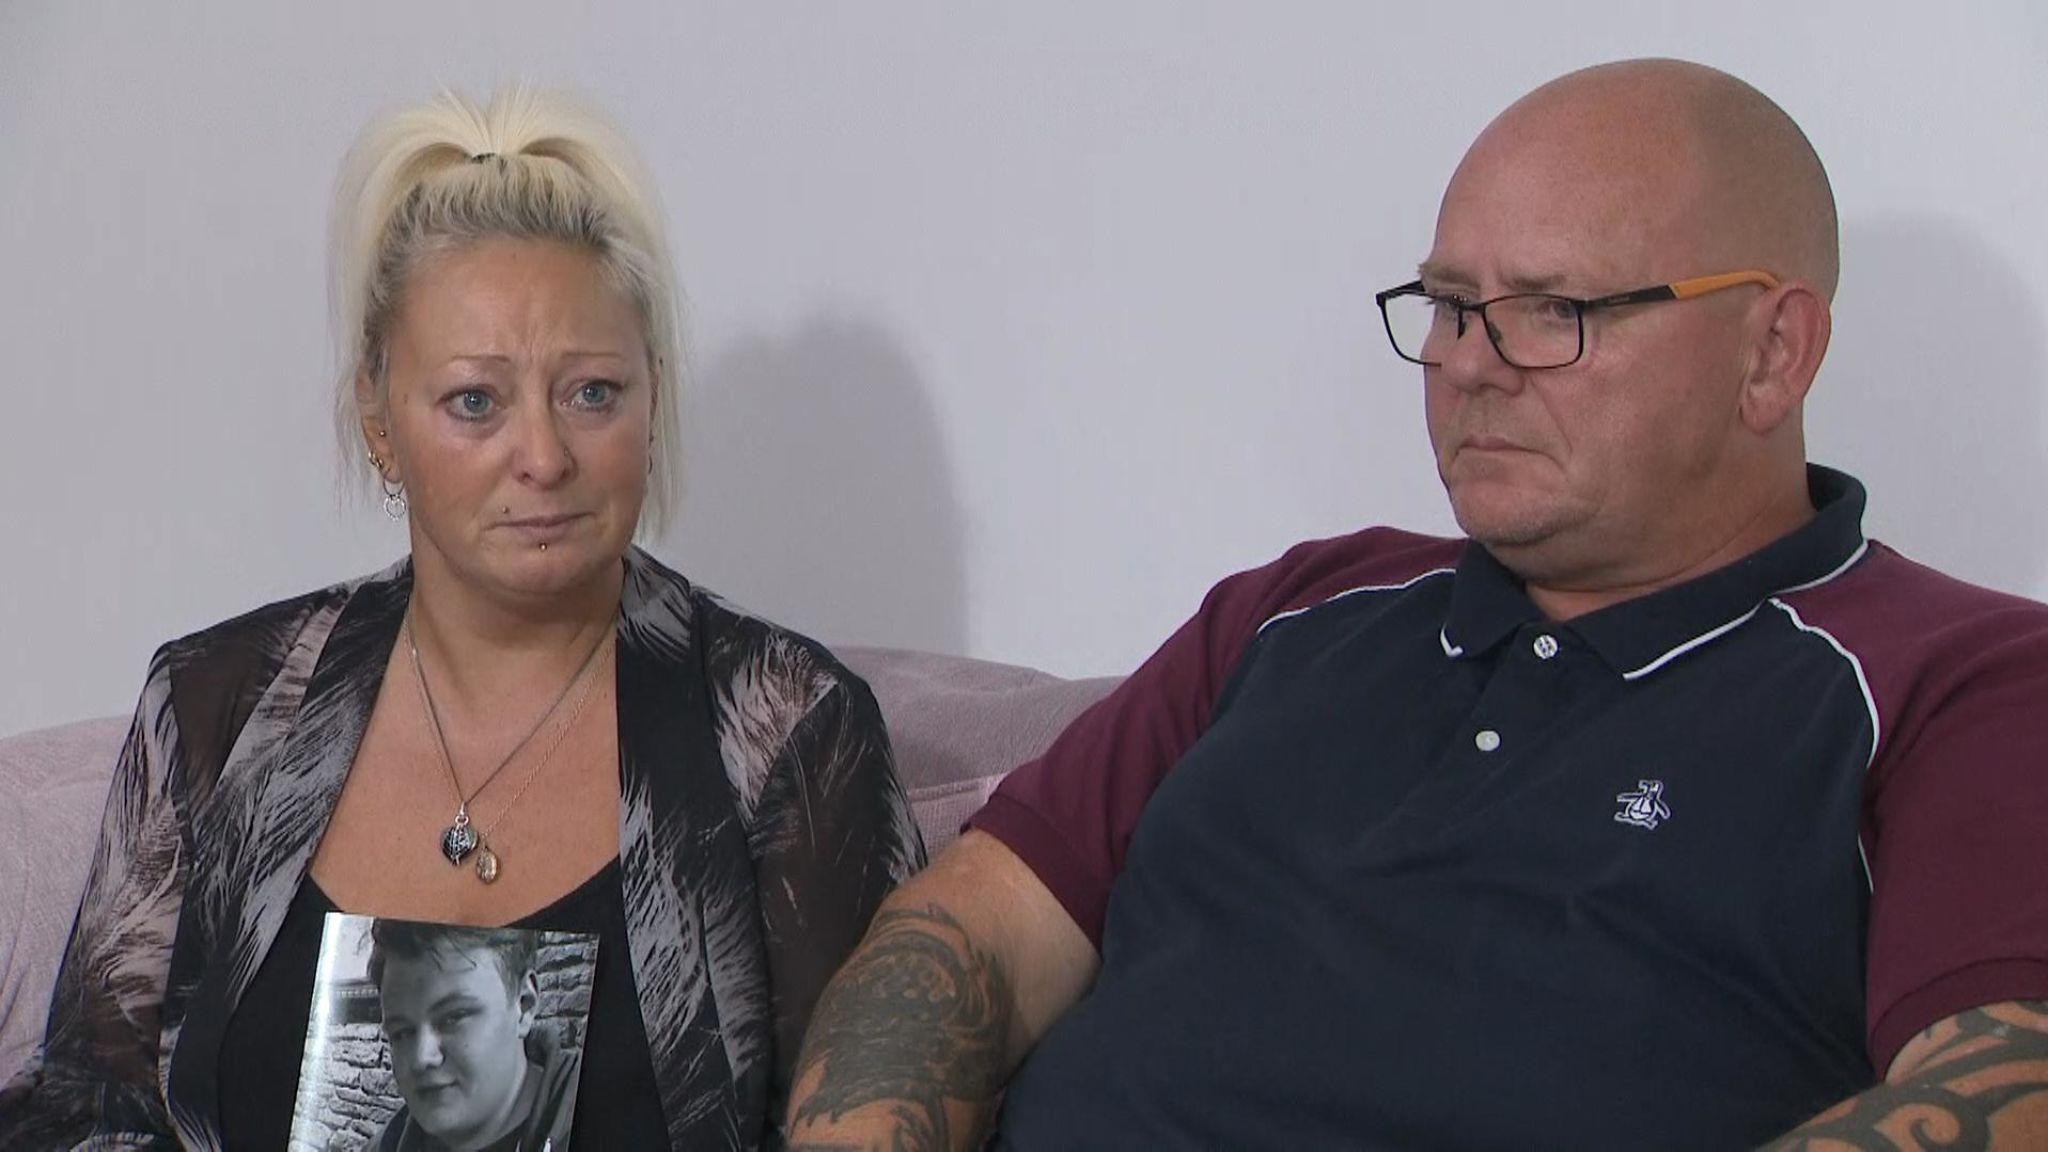 US diplomat's wife suspected of involvement in fatal road crash left UK